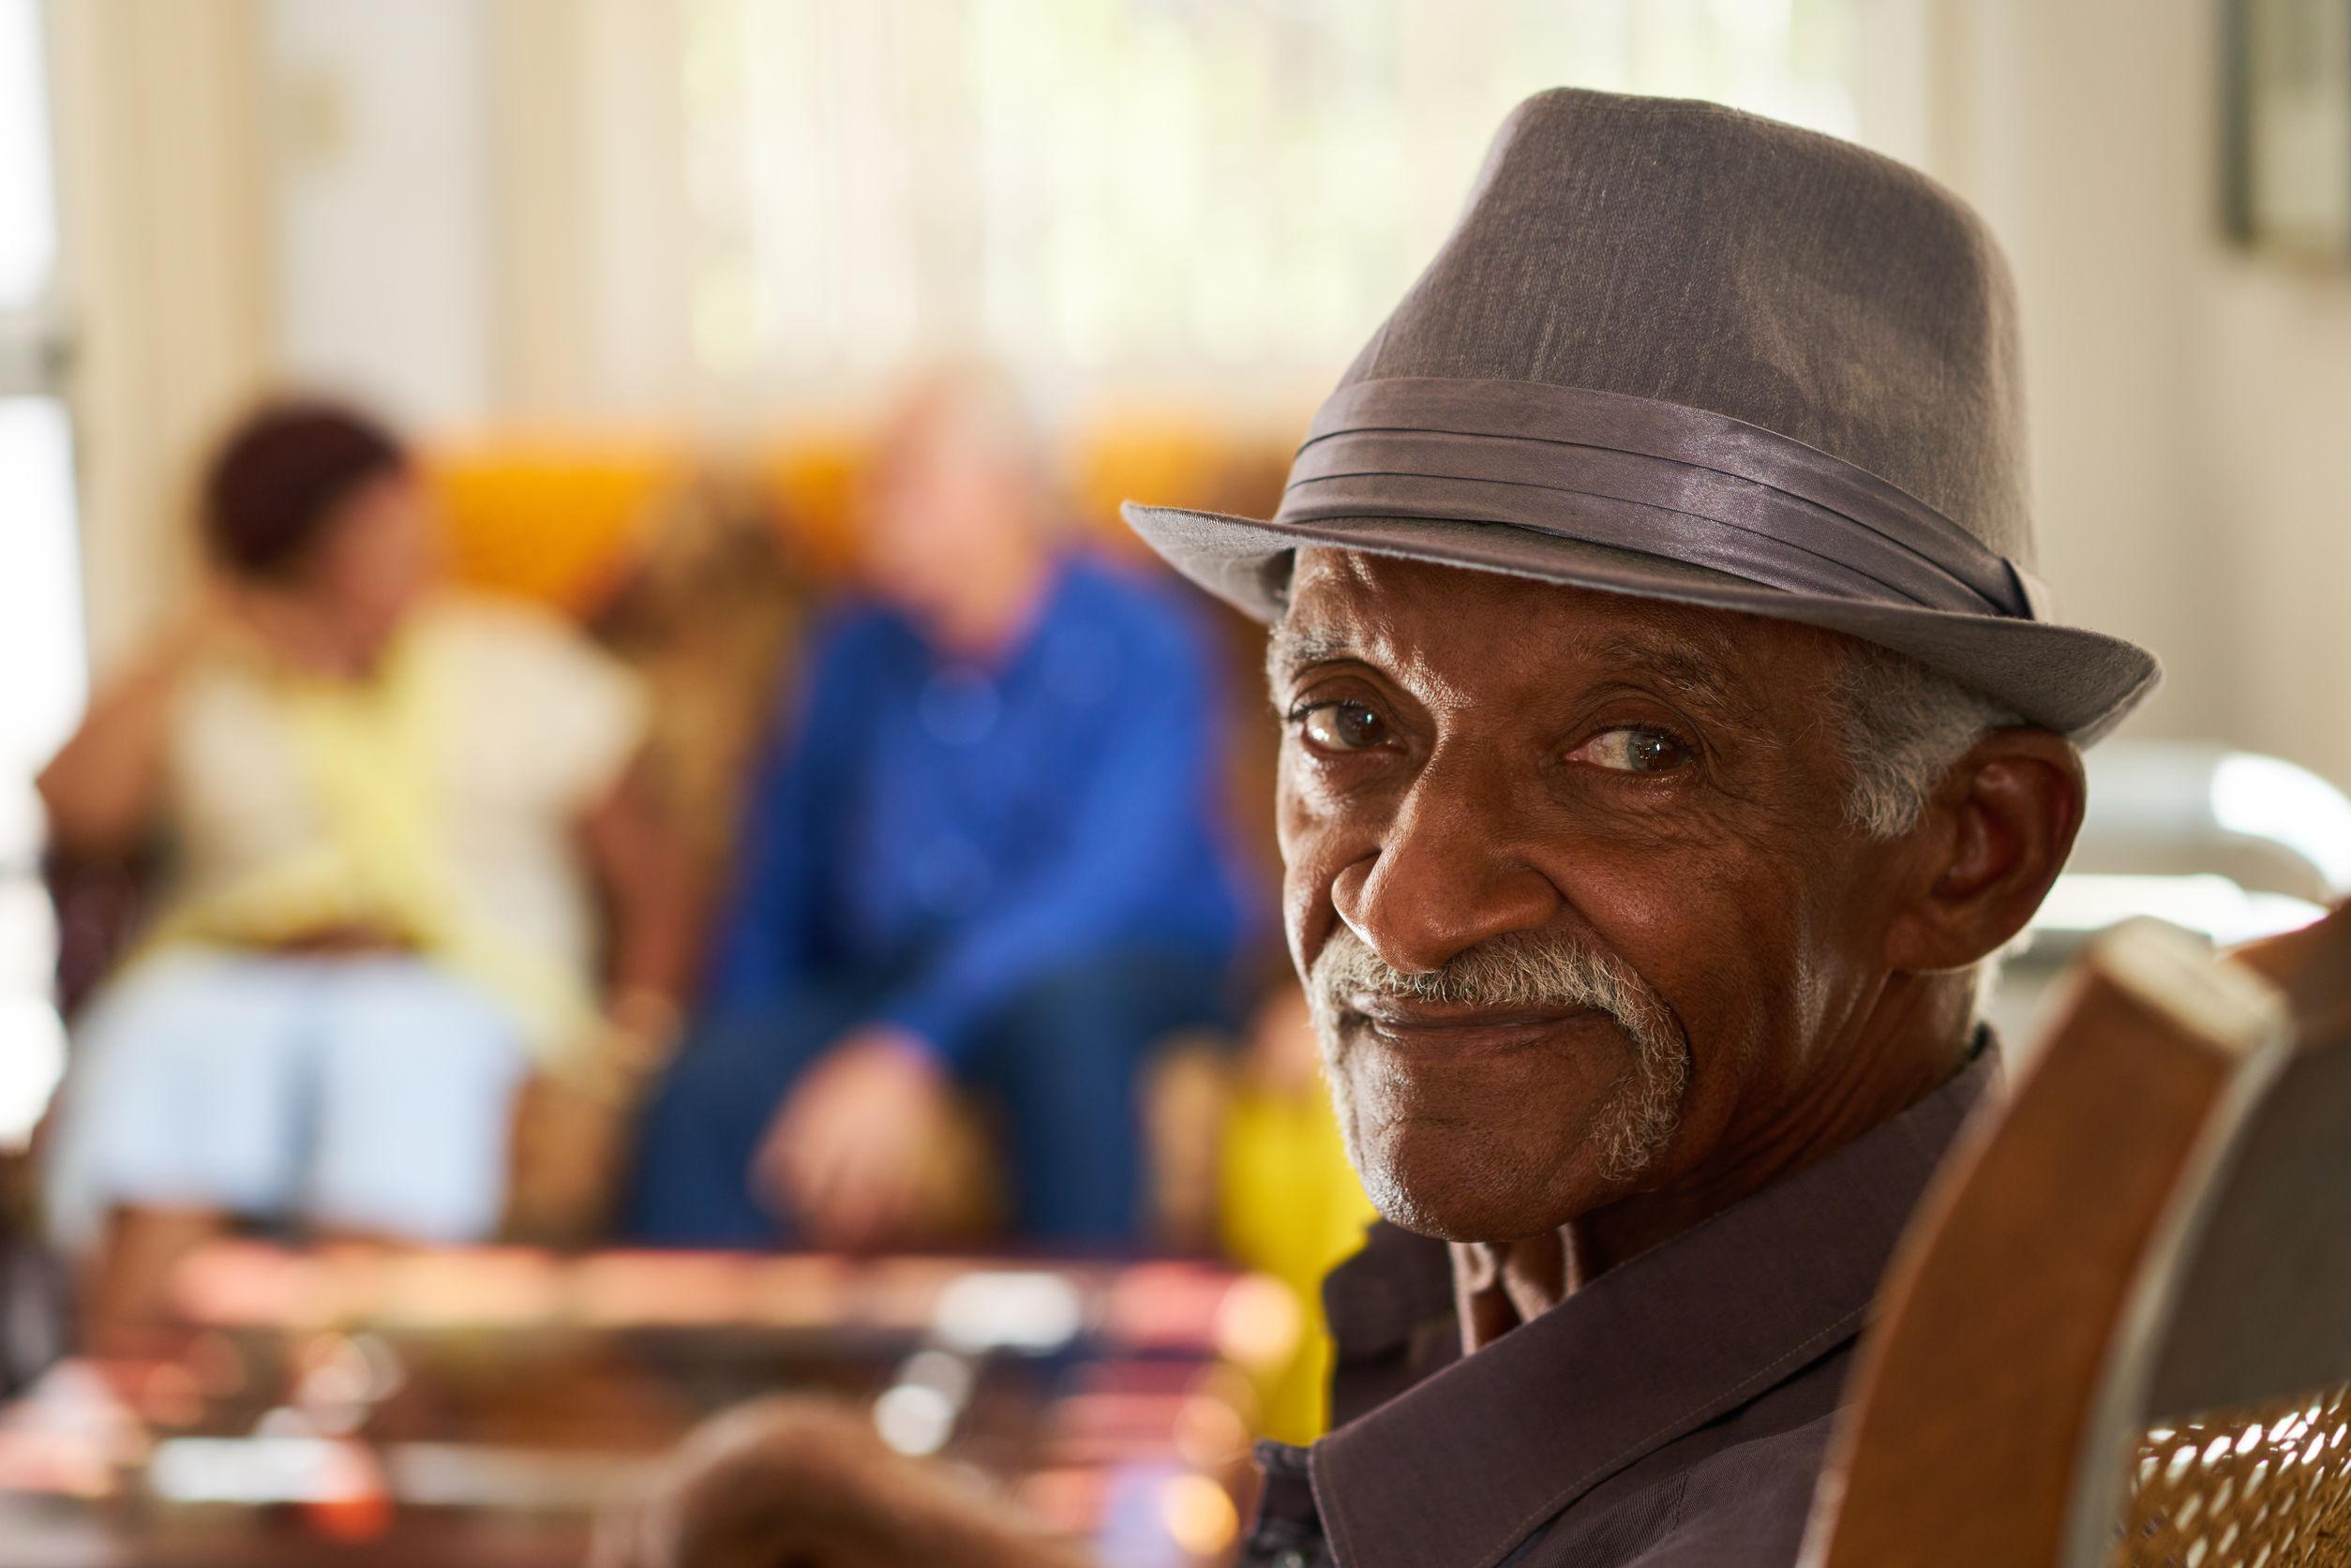 Senior Black Man With Hat Looking At Camera In Nursing Home